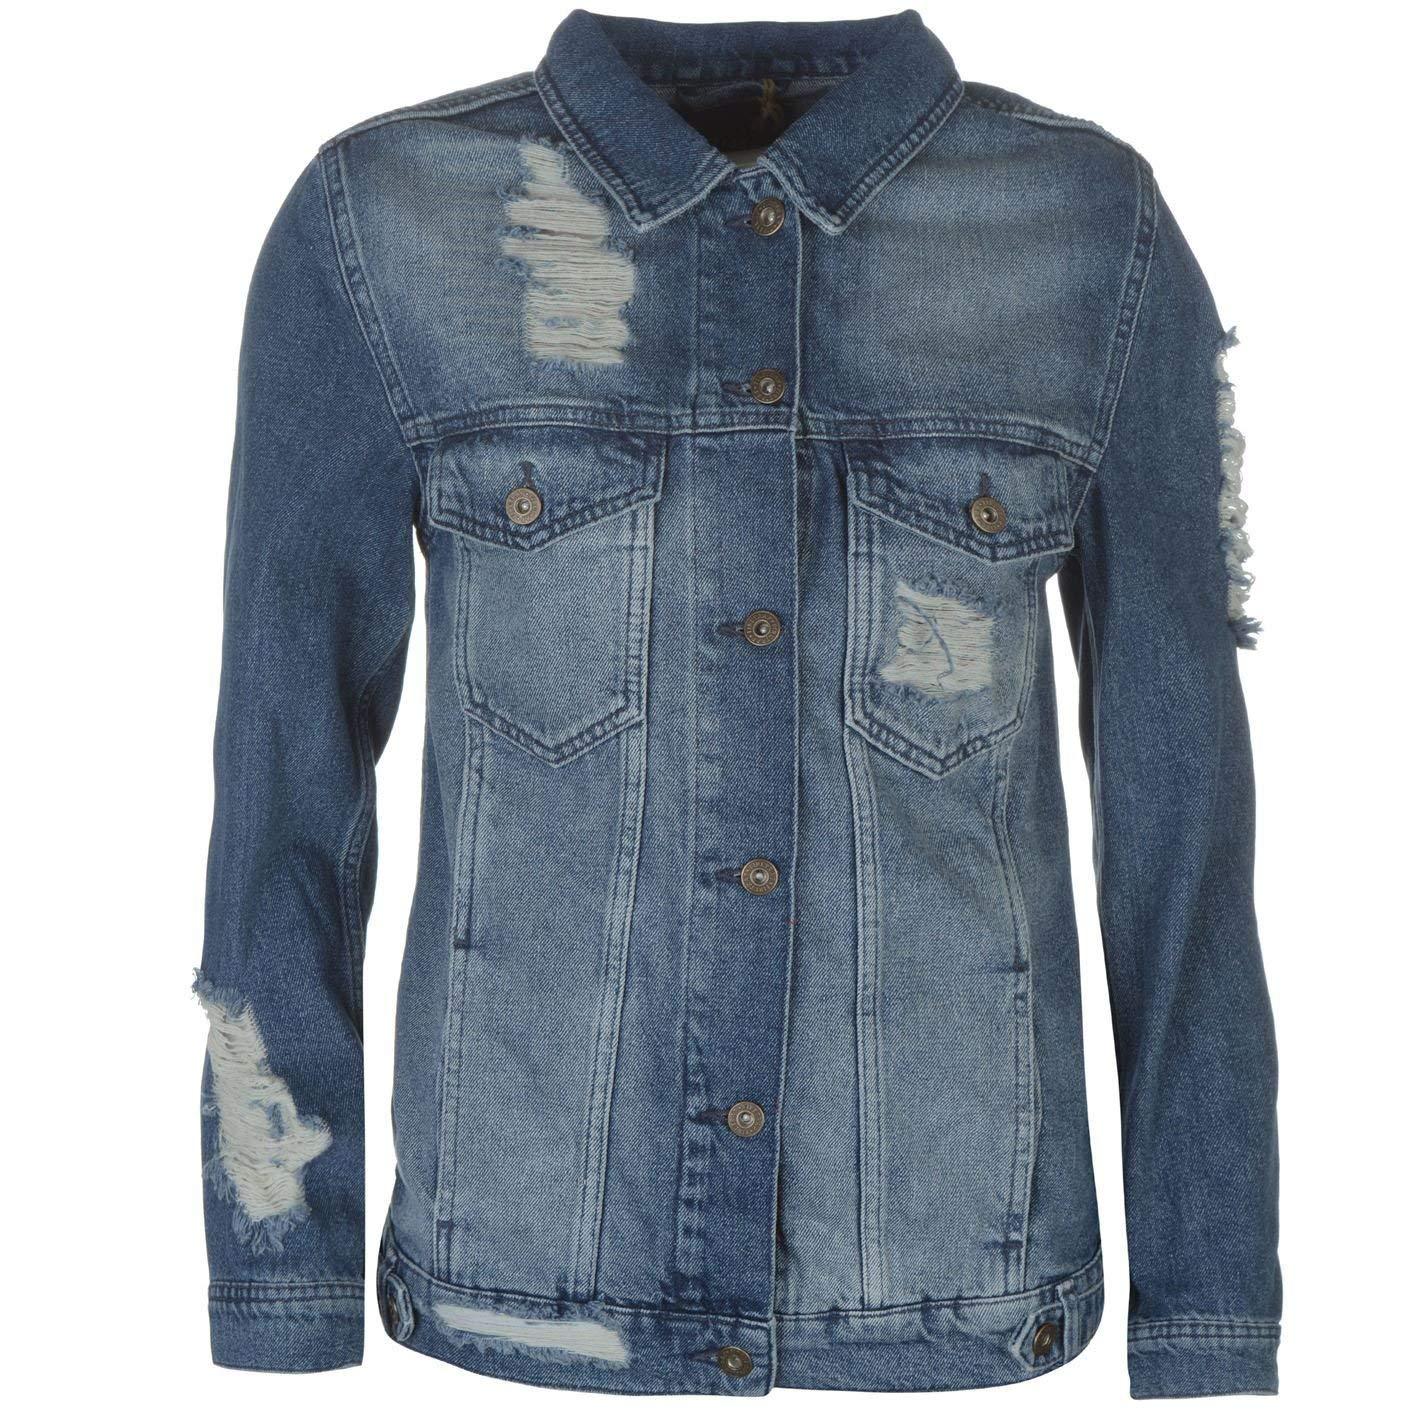 c7b5d6fdc11cb Get Quotations · Firetrap Womens Blackseal Distressed Denim Jacket Coat Top  Long Sleeve Cotton